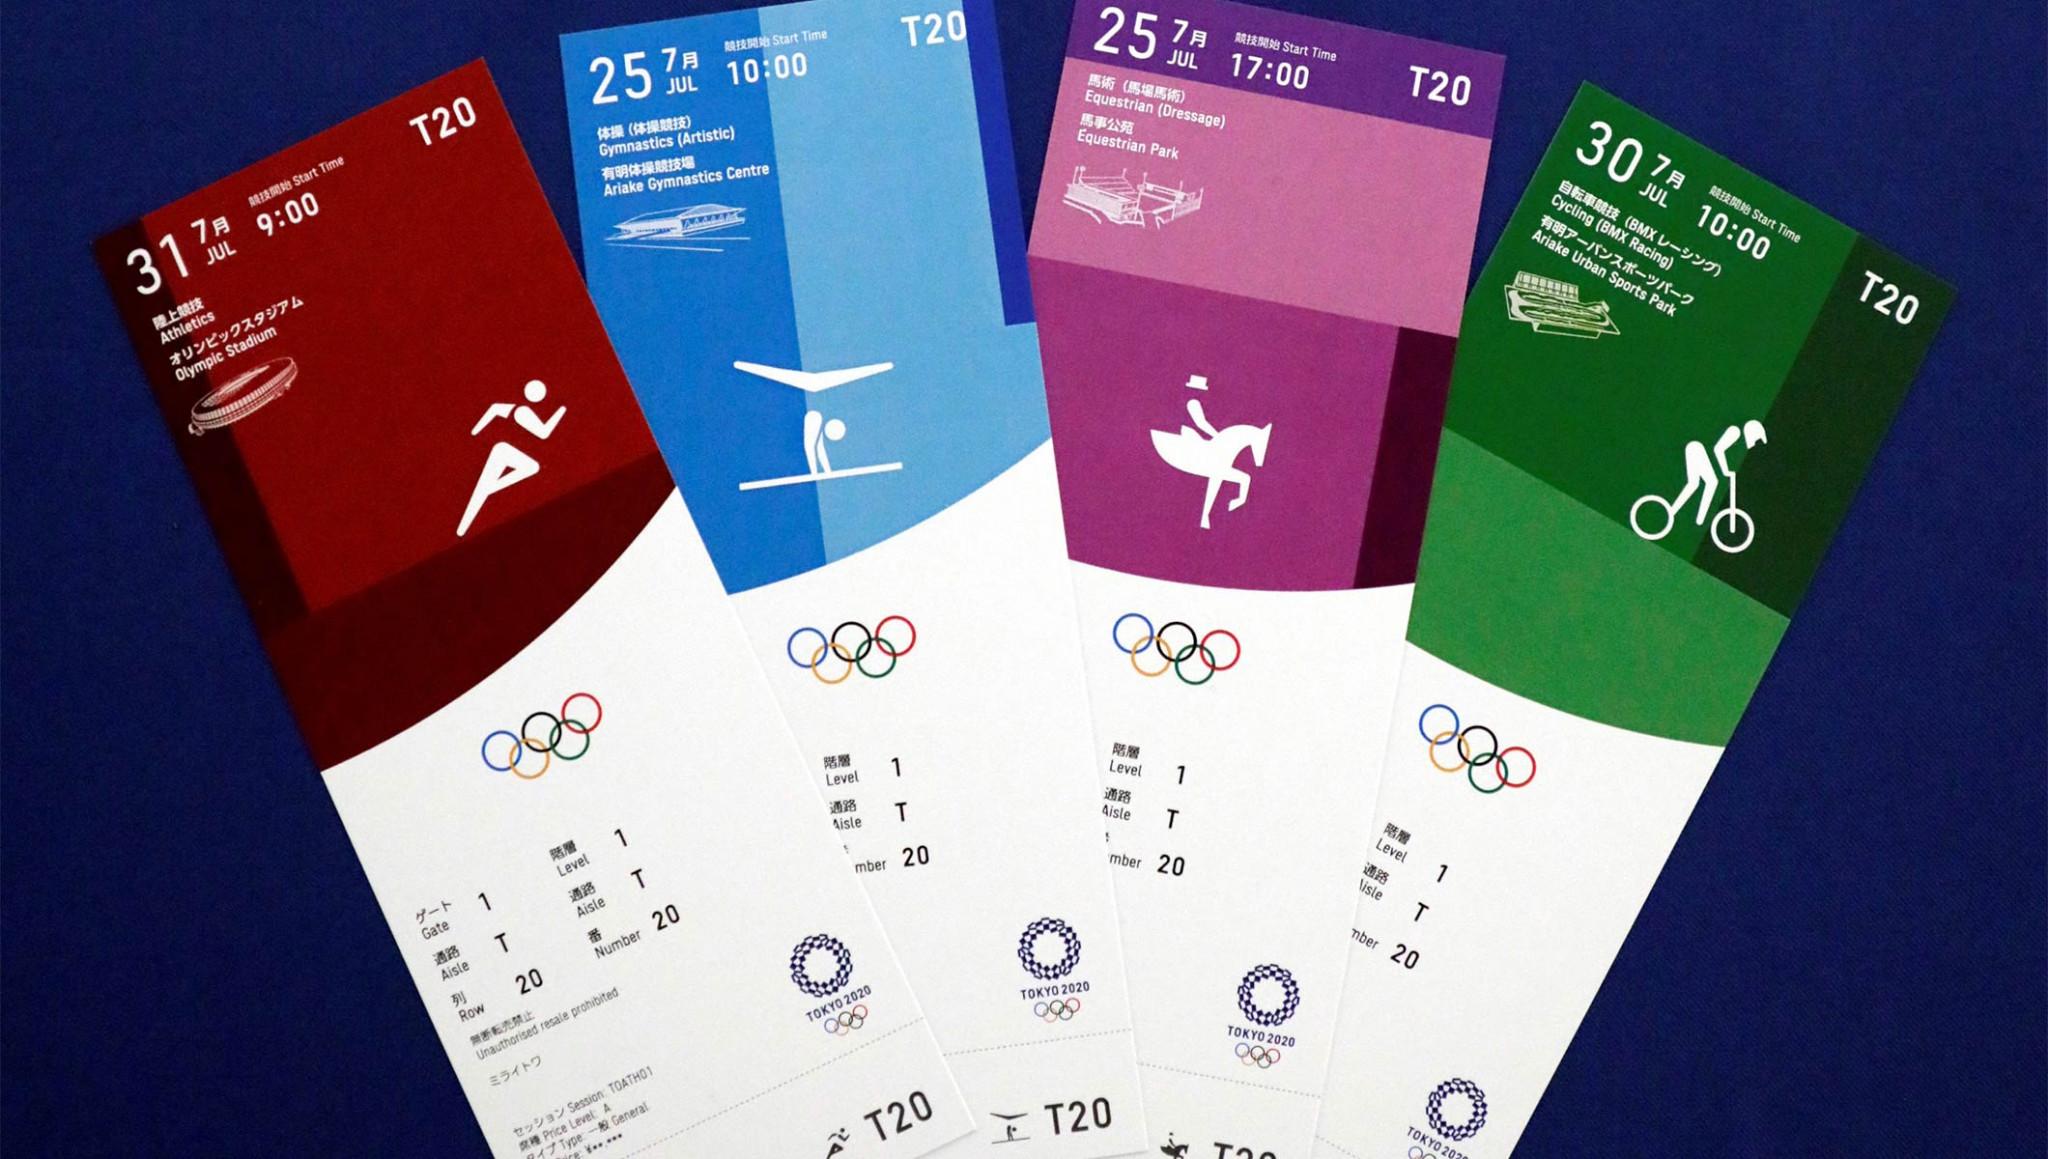 ATRs Olympic role redundant after new hospitality deal, De Kepper confirms